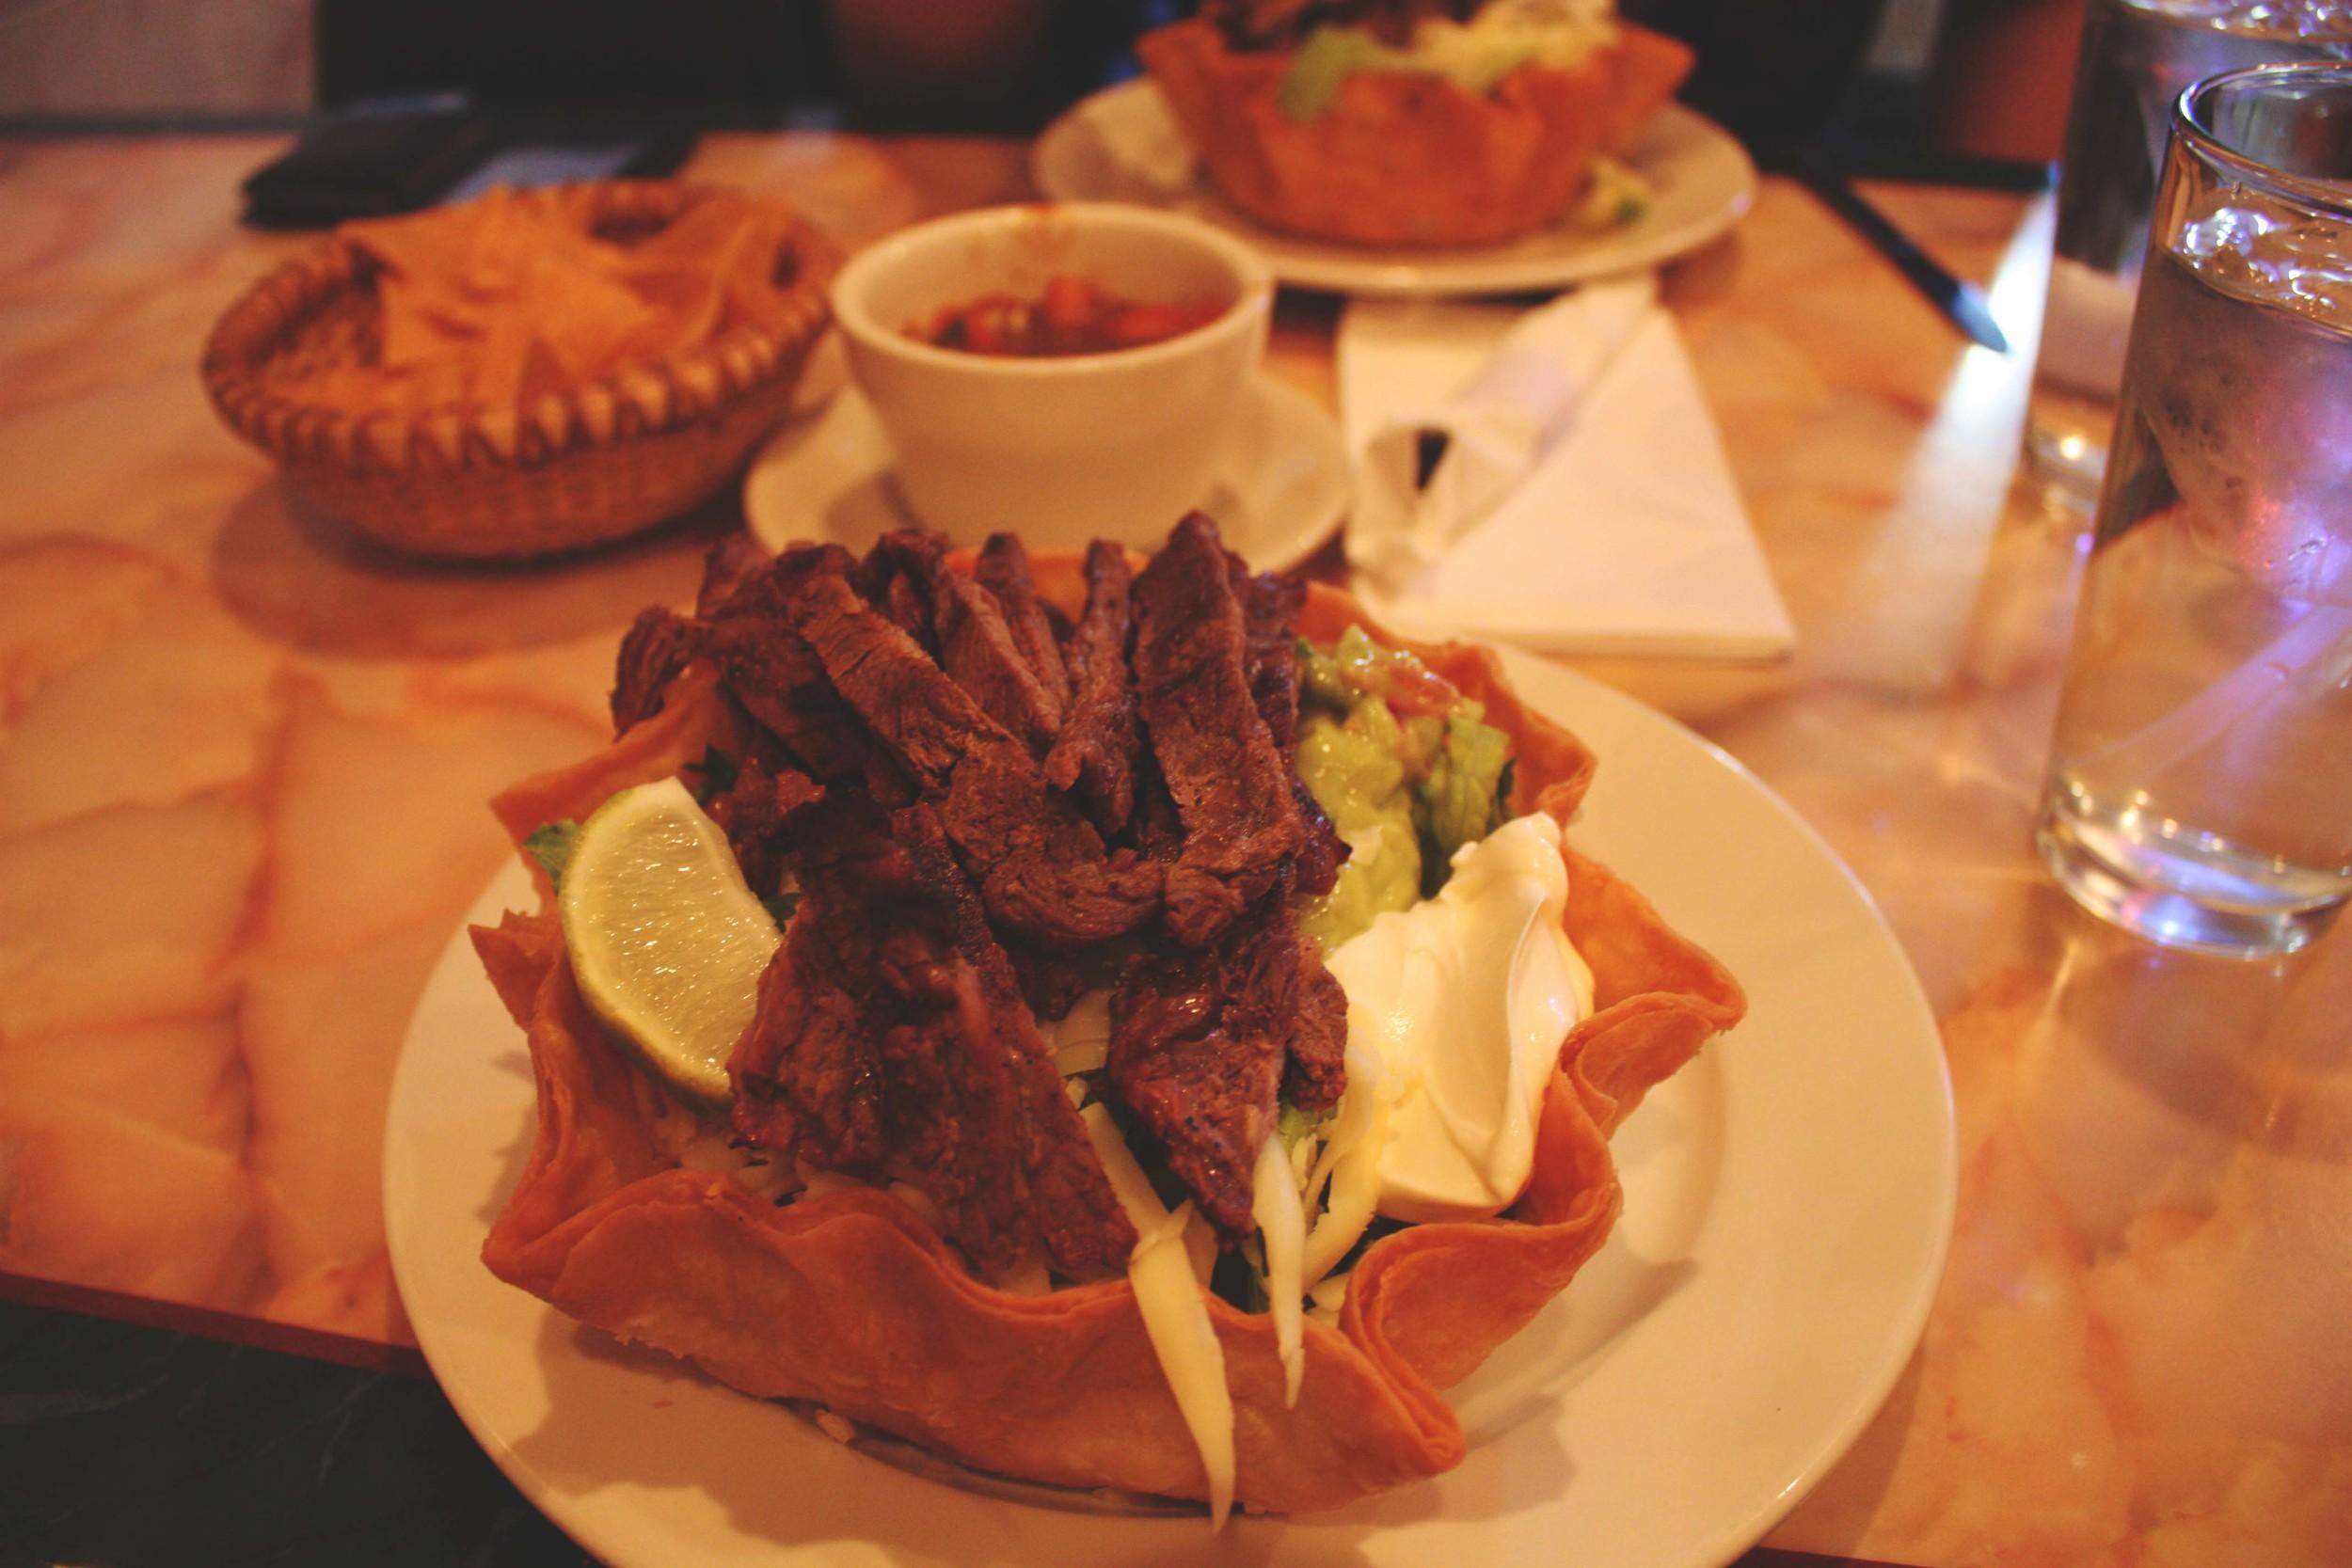 El Ranchito 's Taco Salad.  Hopefully the image does it justice.